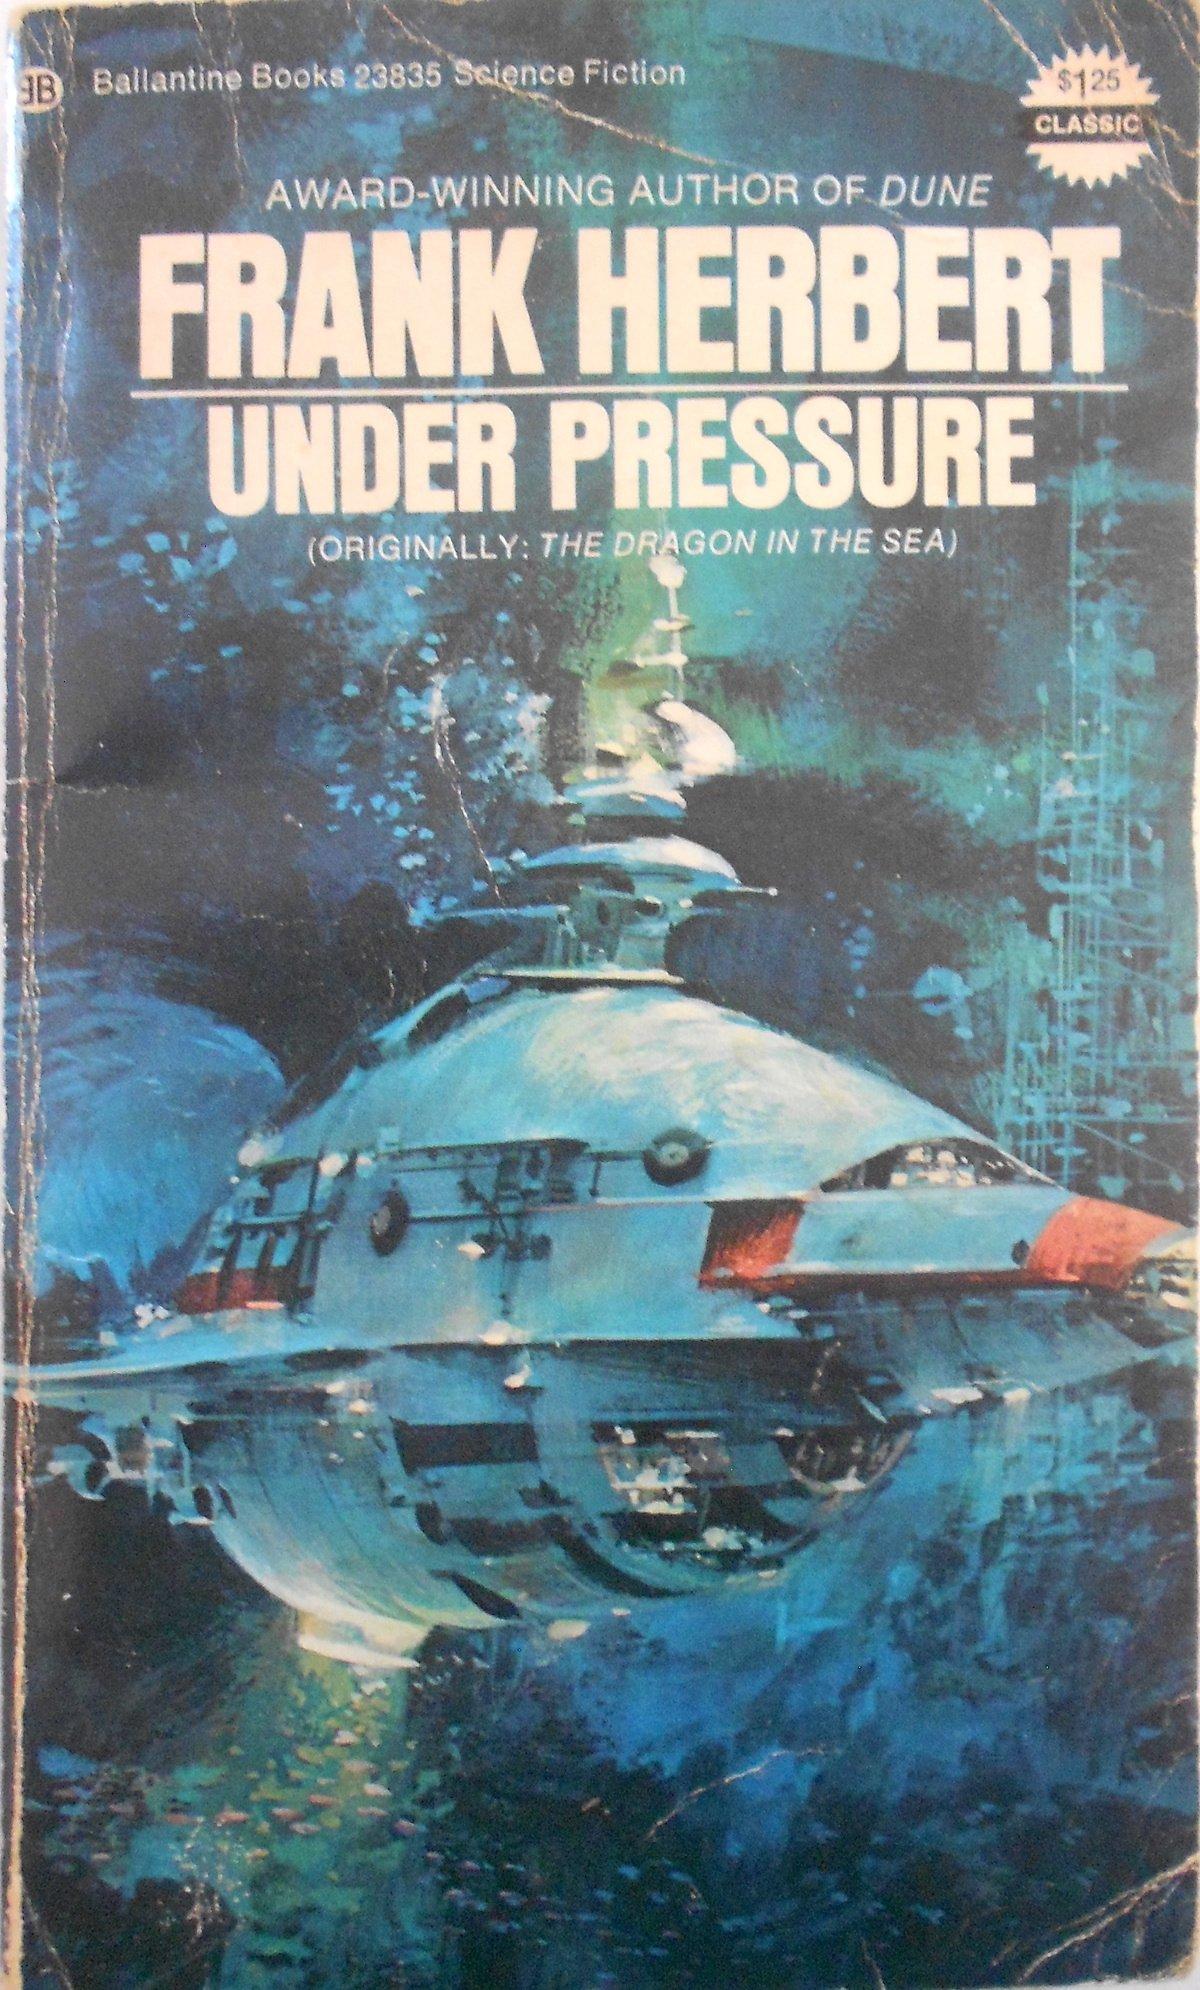 Under Pressure: Frank Herbert, John Berkey: 9780345244949: Amazon.com: Books